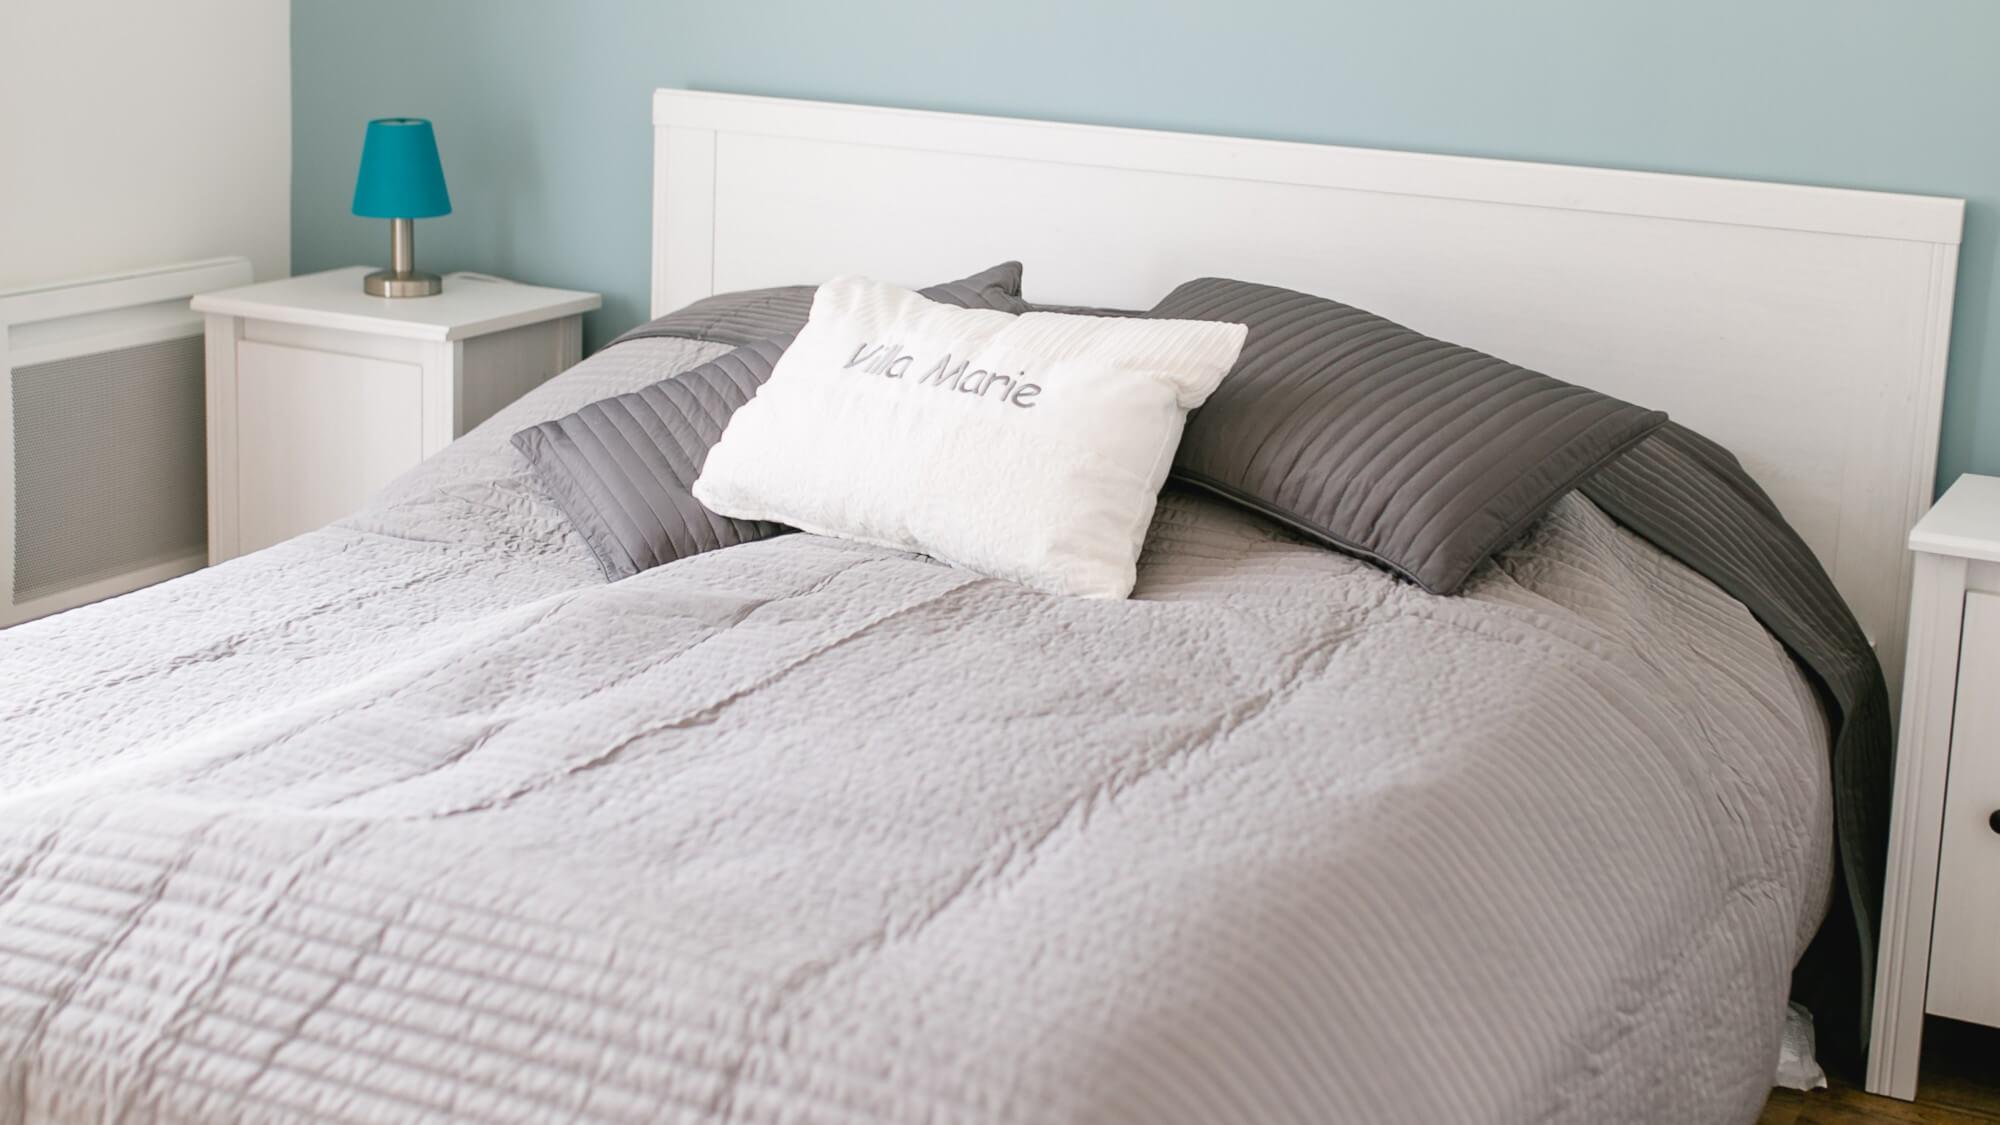 Villa Marie Ferienhaus Provence Schlafzimmer 2 Bett